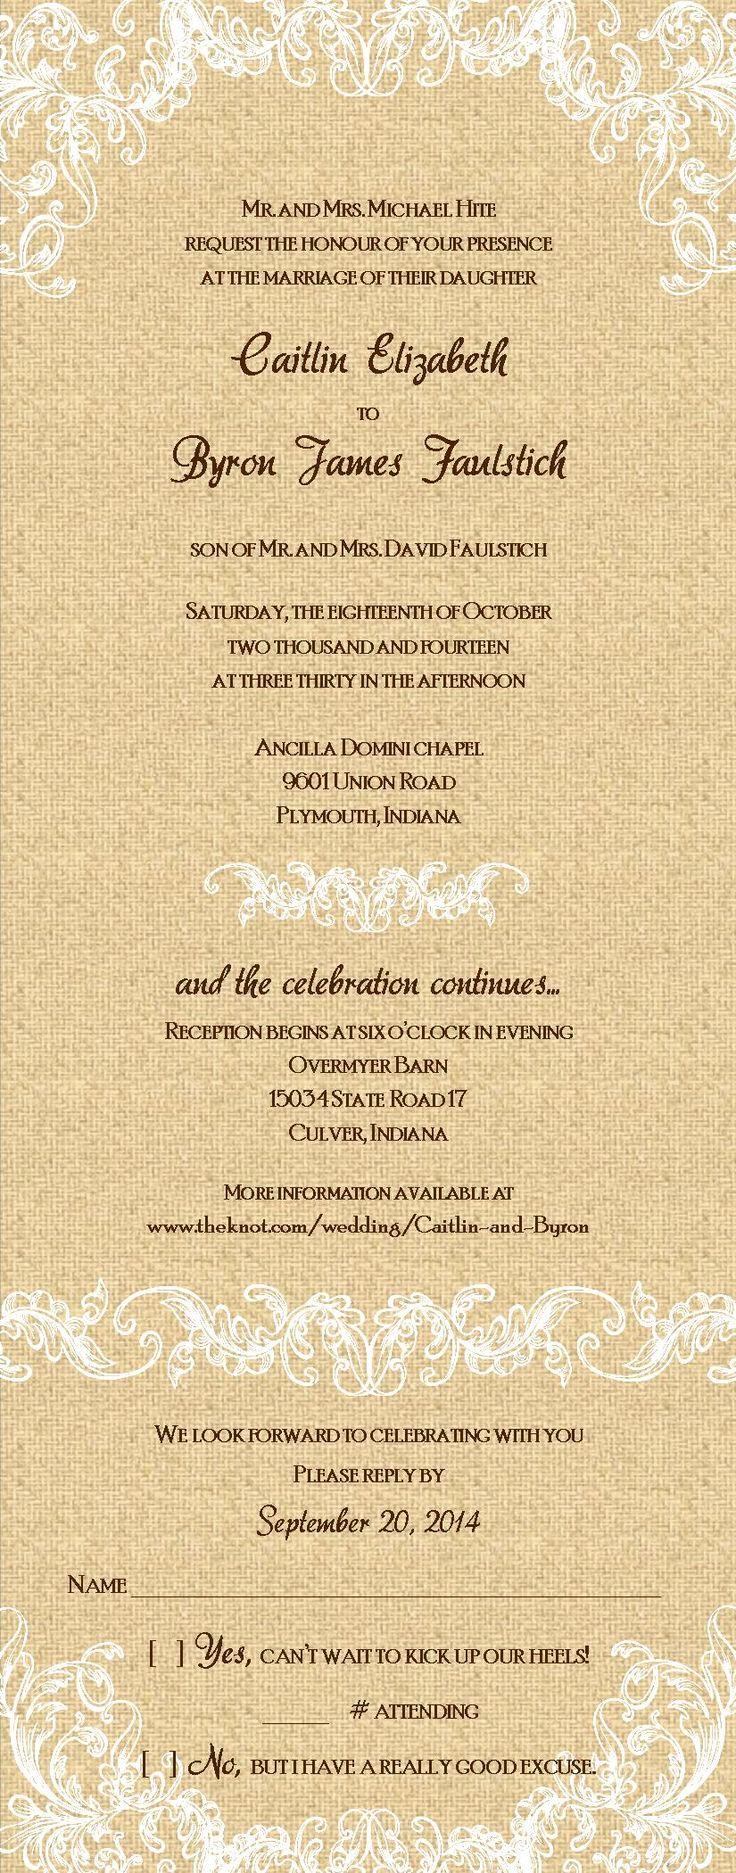 100 Best Wedding Stationery By Bowen Images On Pinterest Wedding